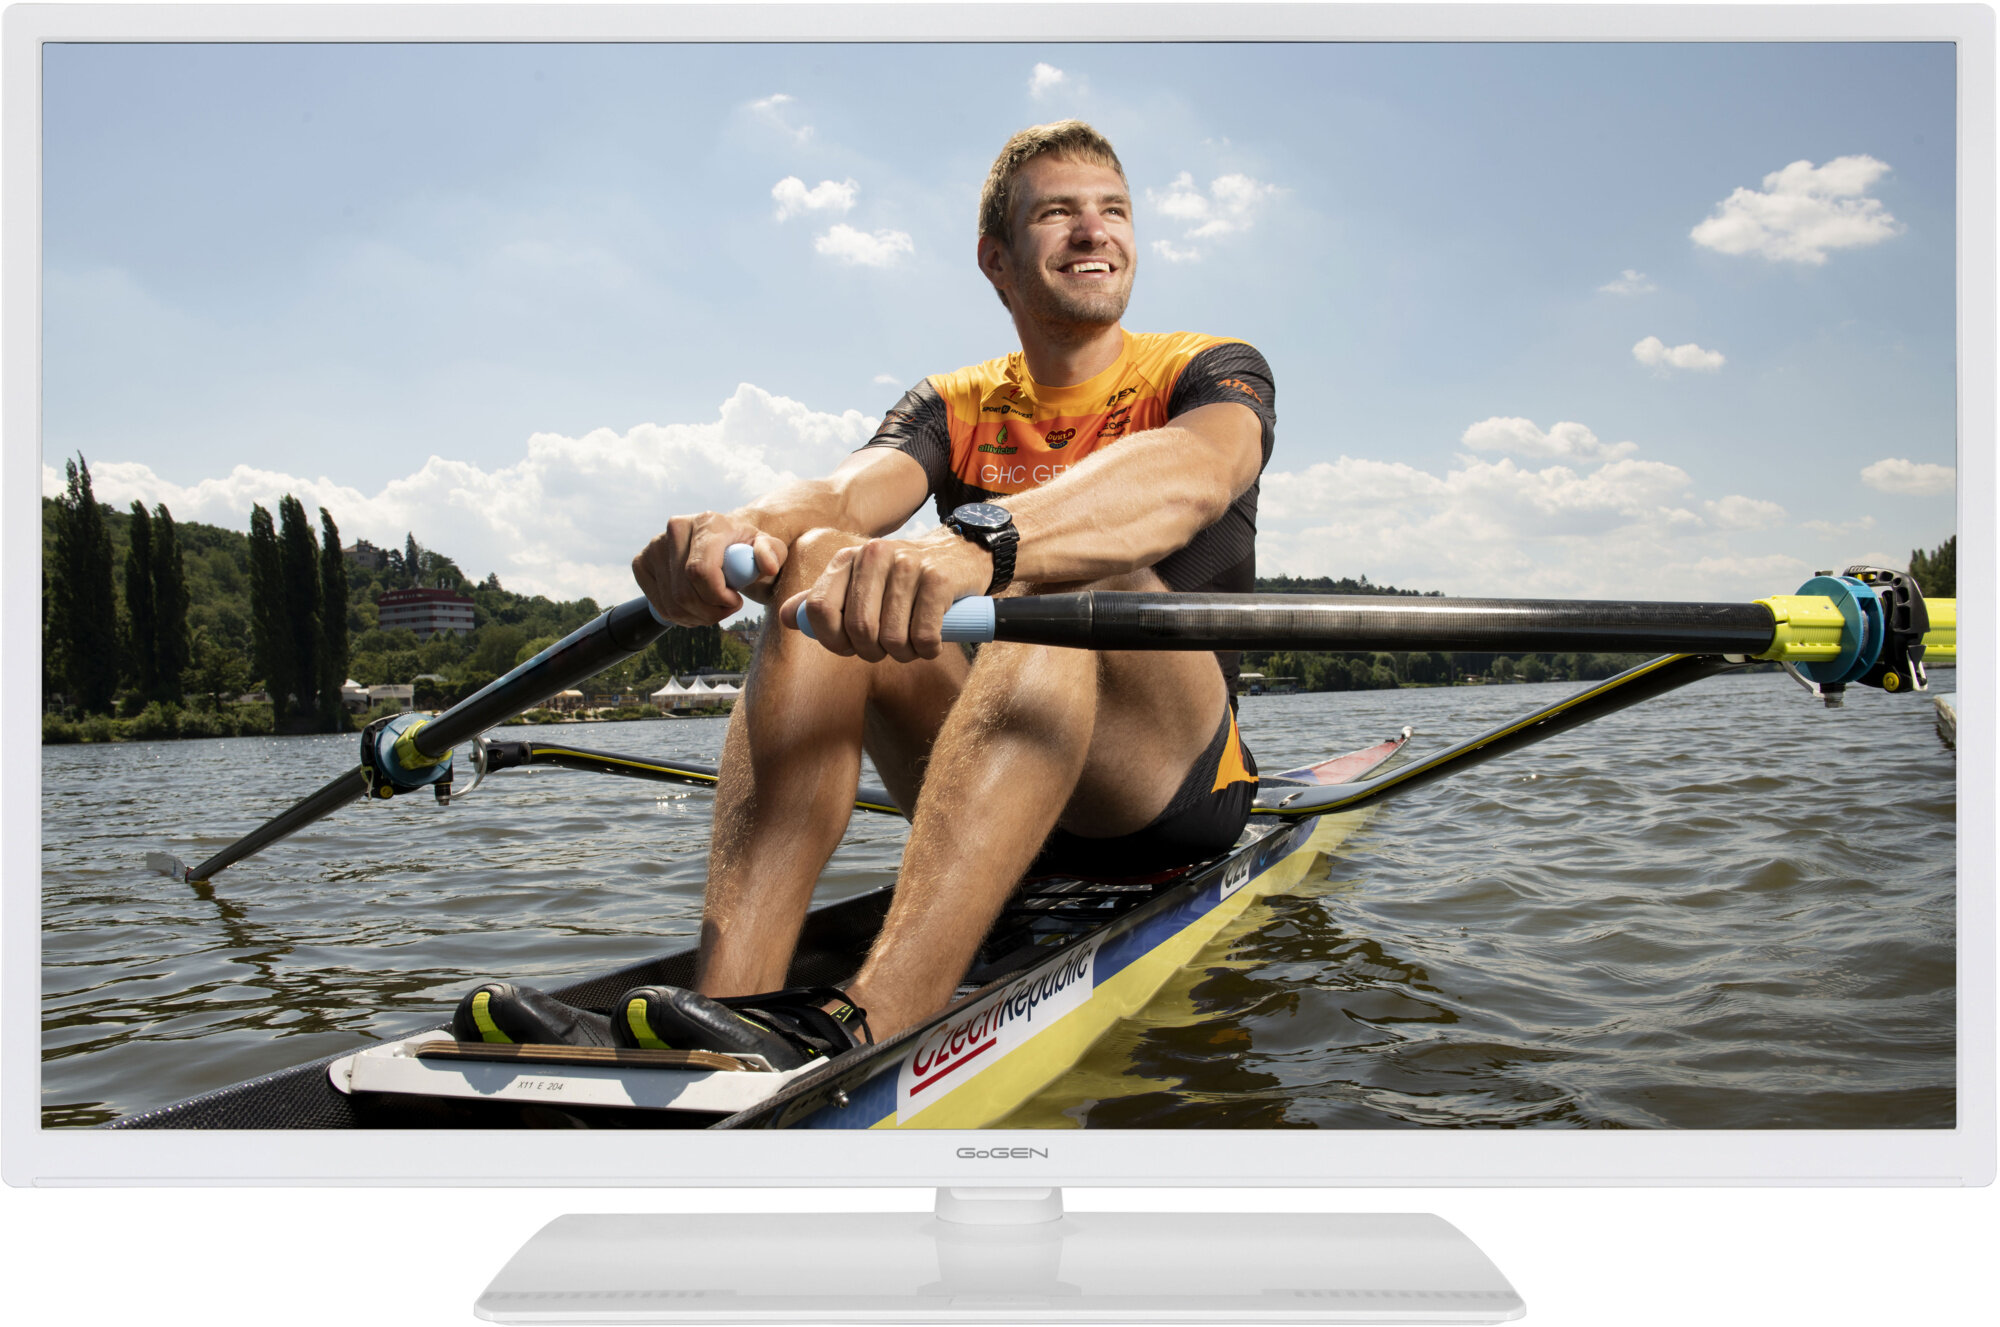 GoGEN TVH32R640STWEBW Smart TV; GOGTVH32R640STWEBW